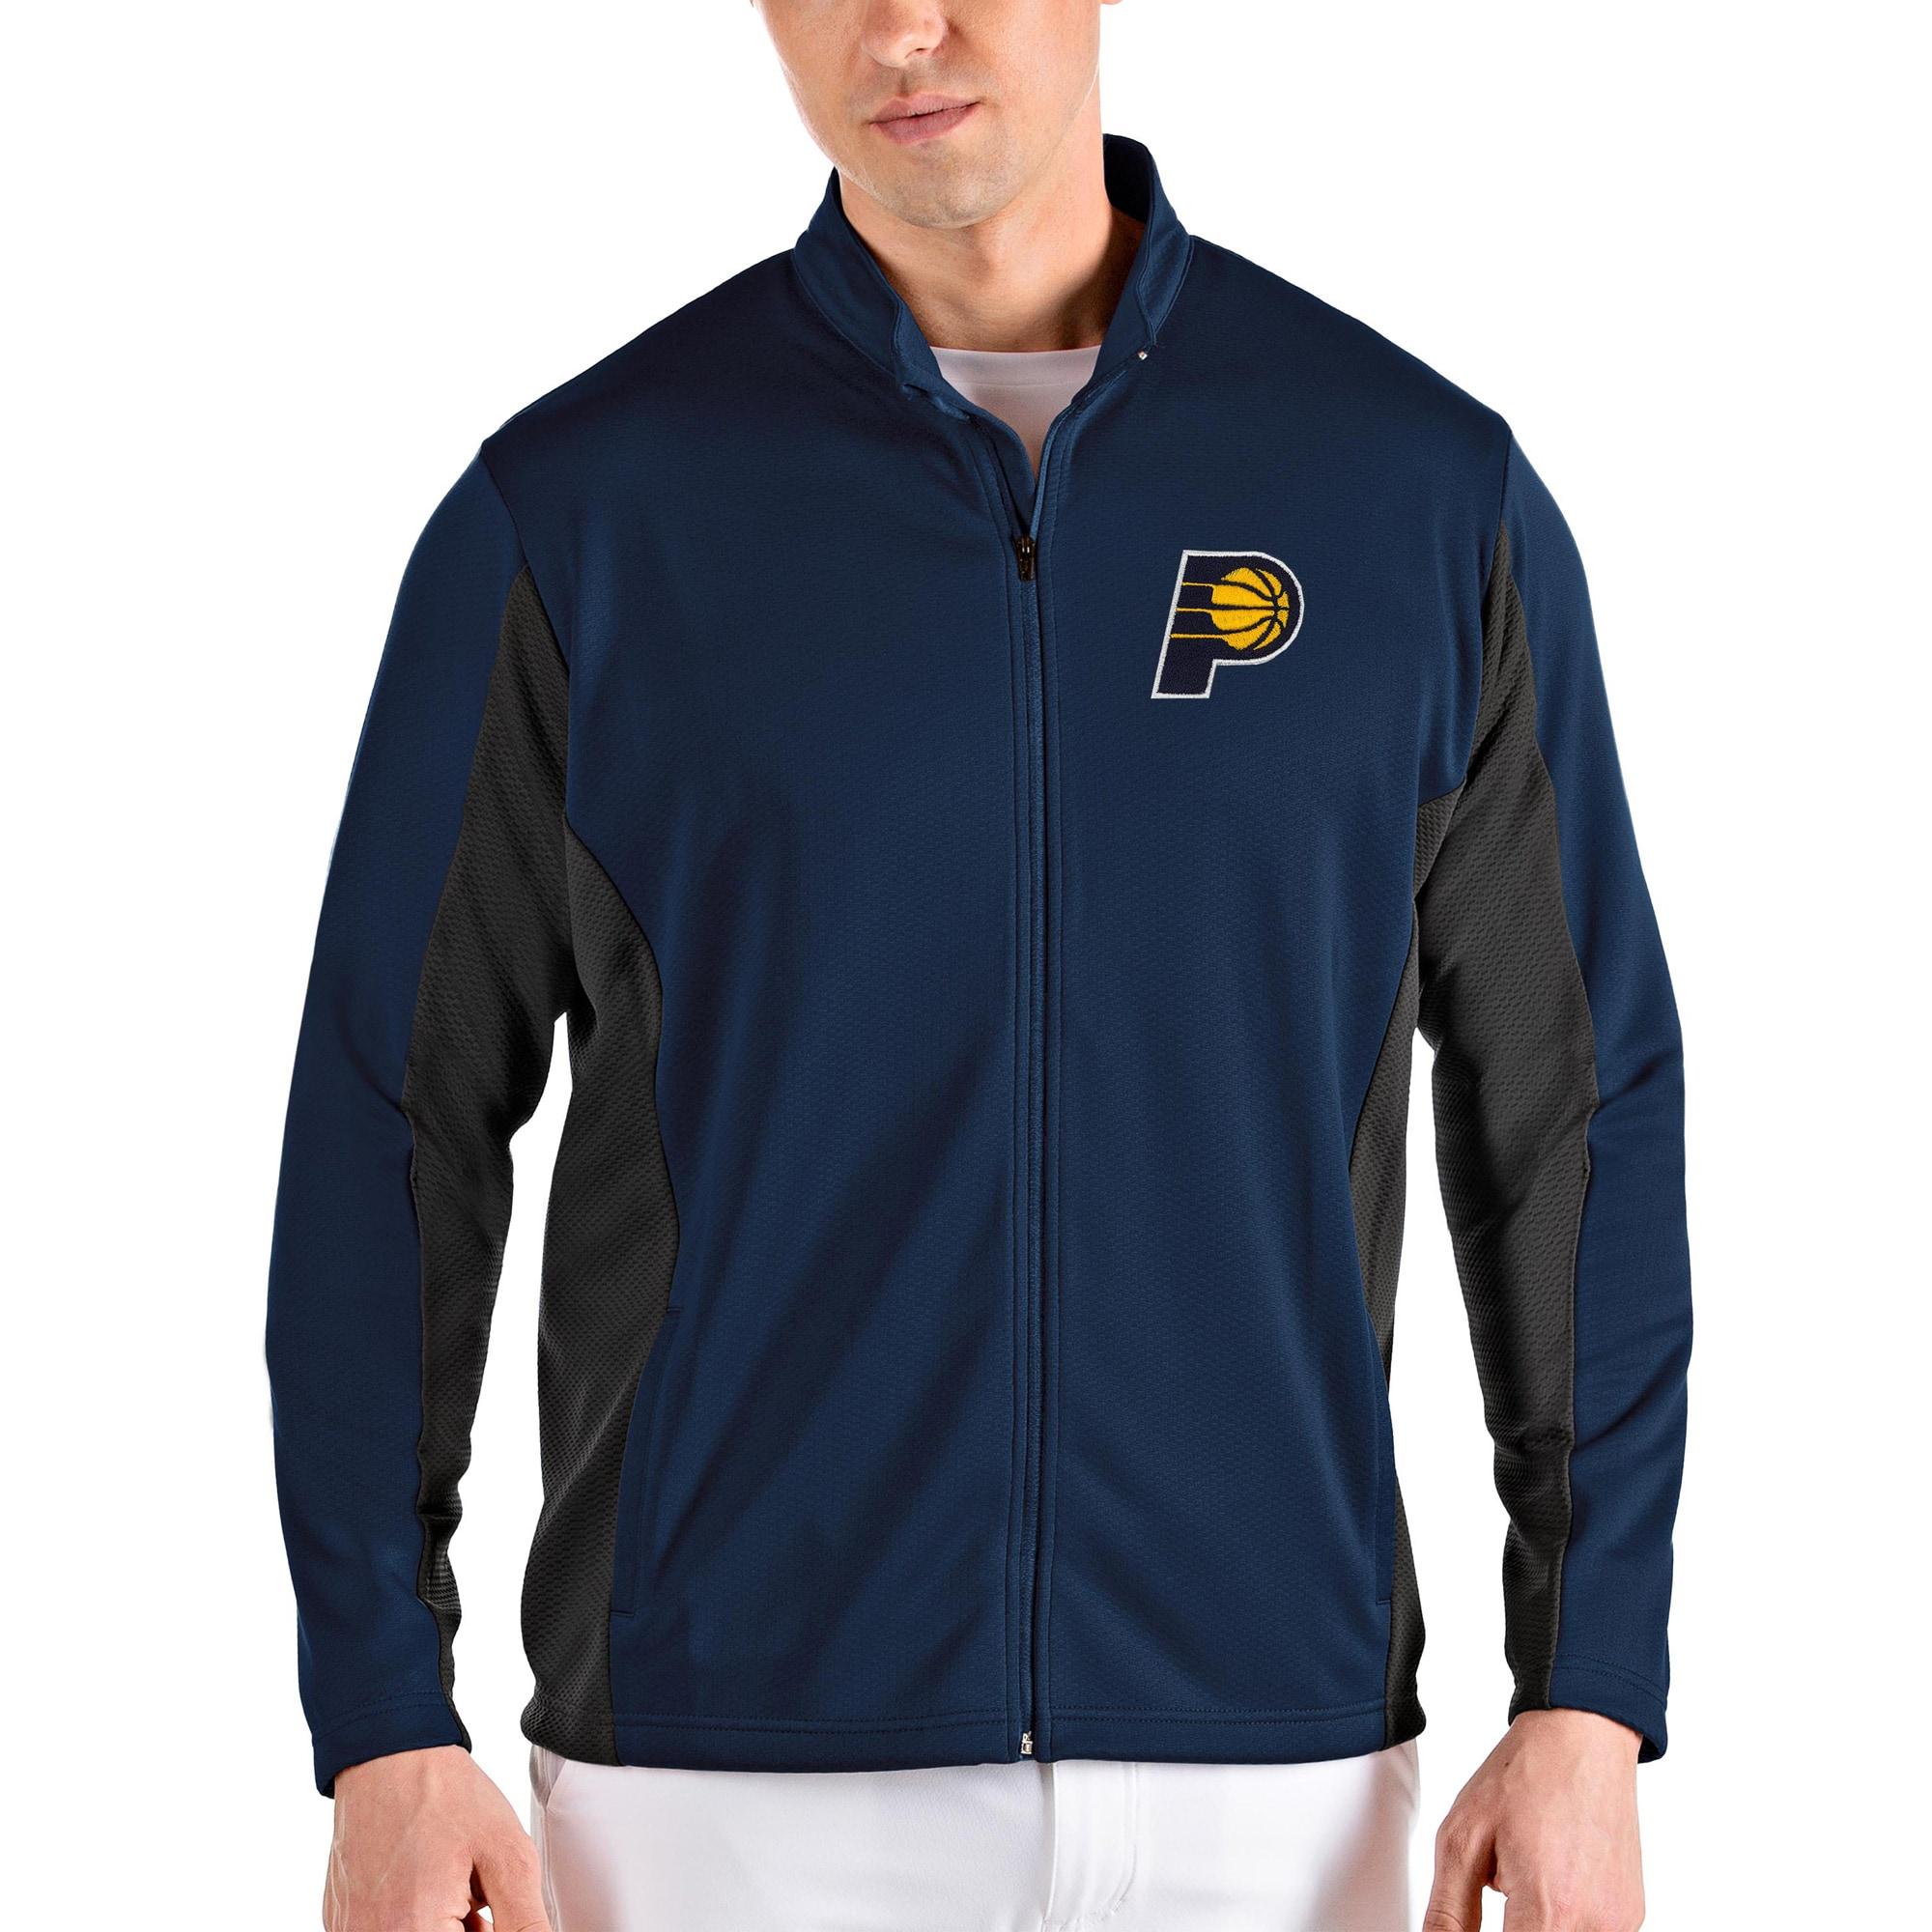 Indiana Pacers Antigua Passage Full-Zip Jacket - Navy/Gray